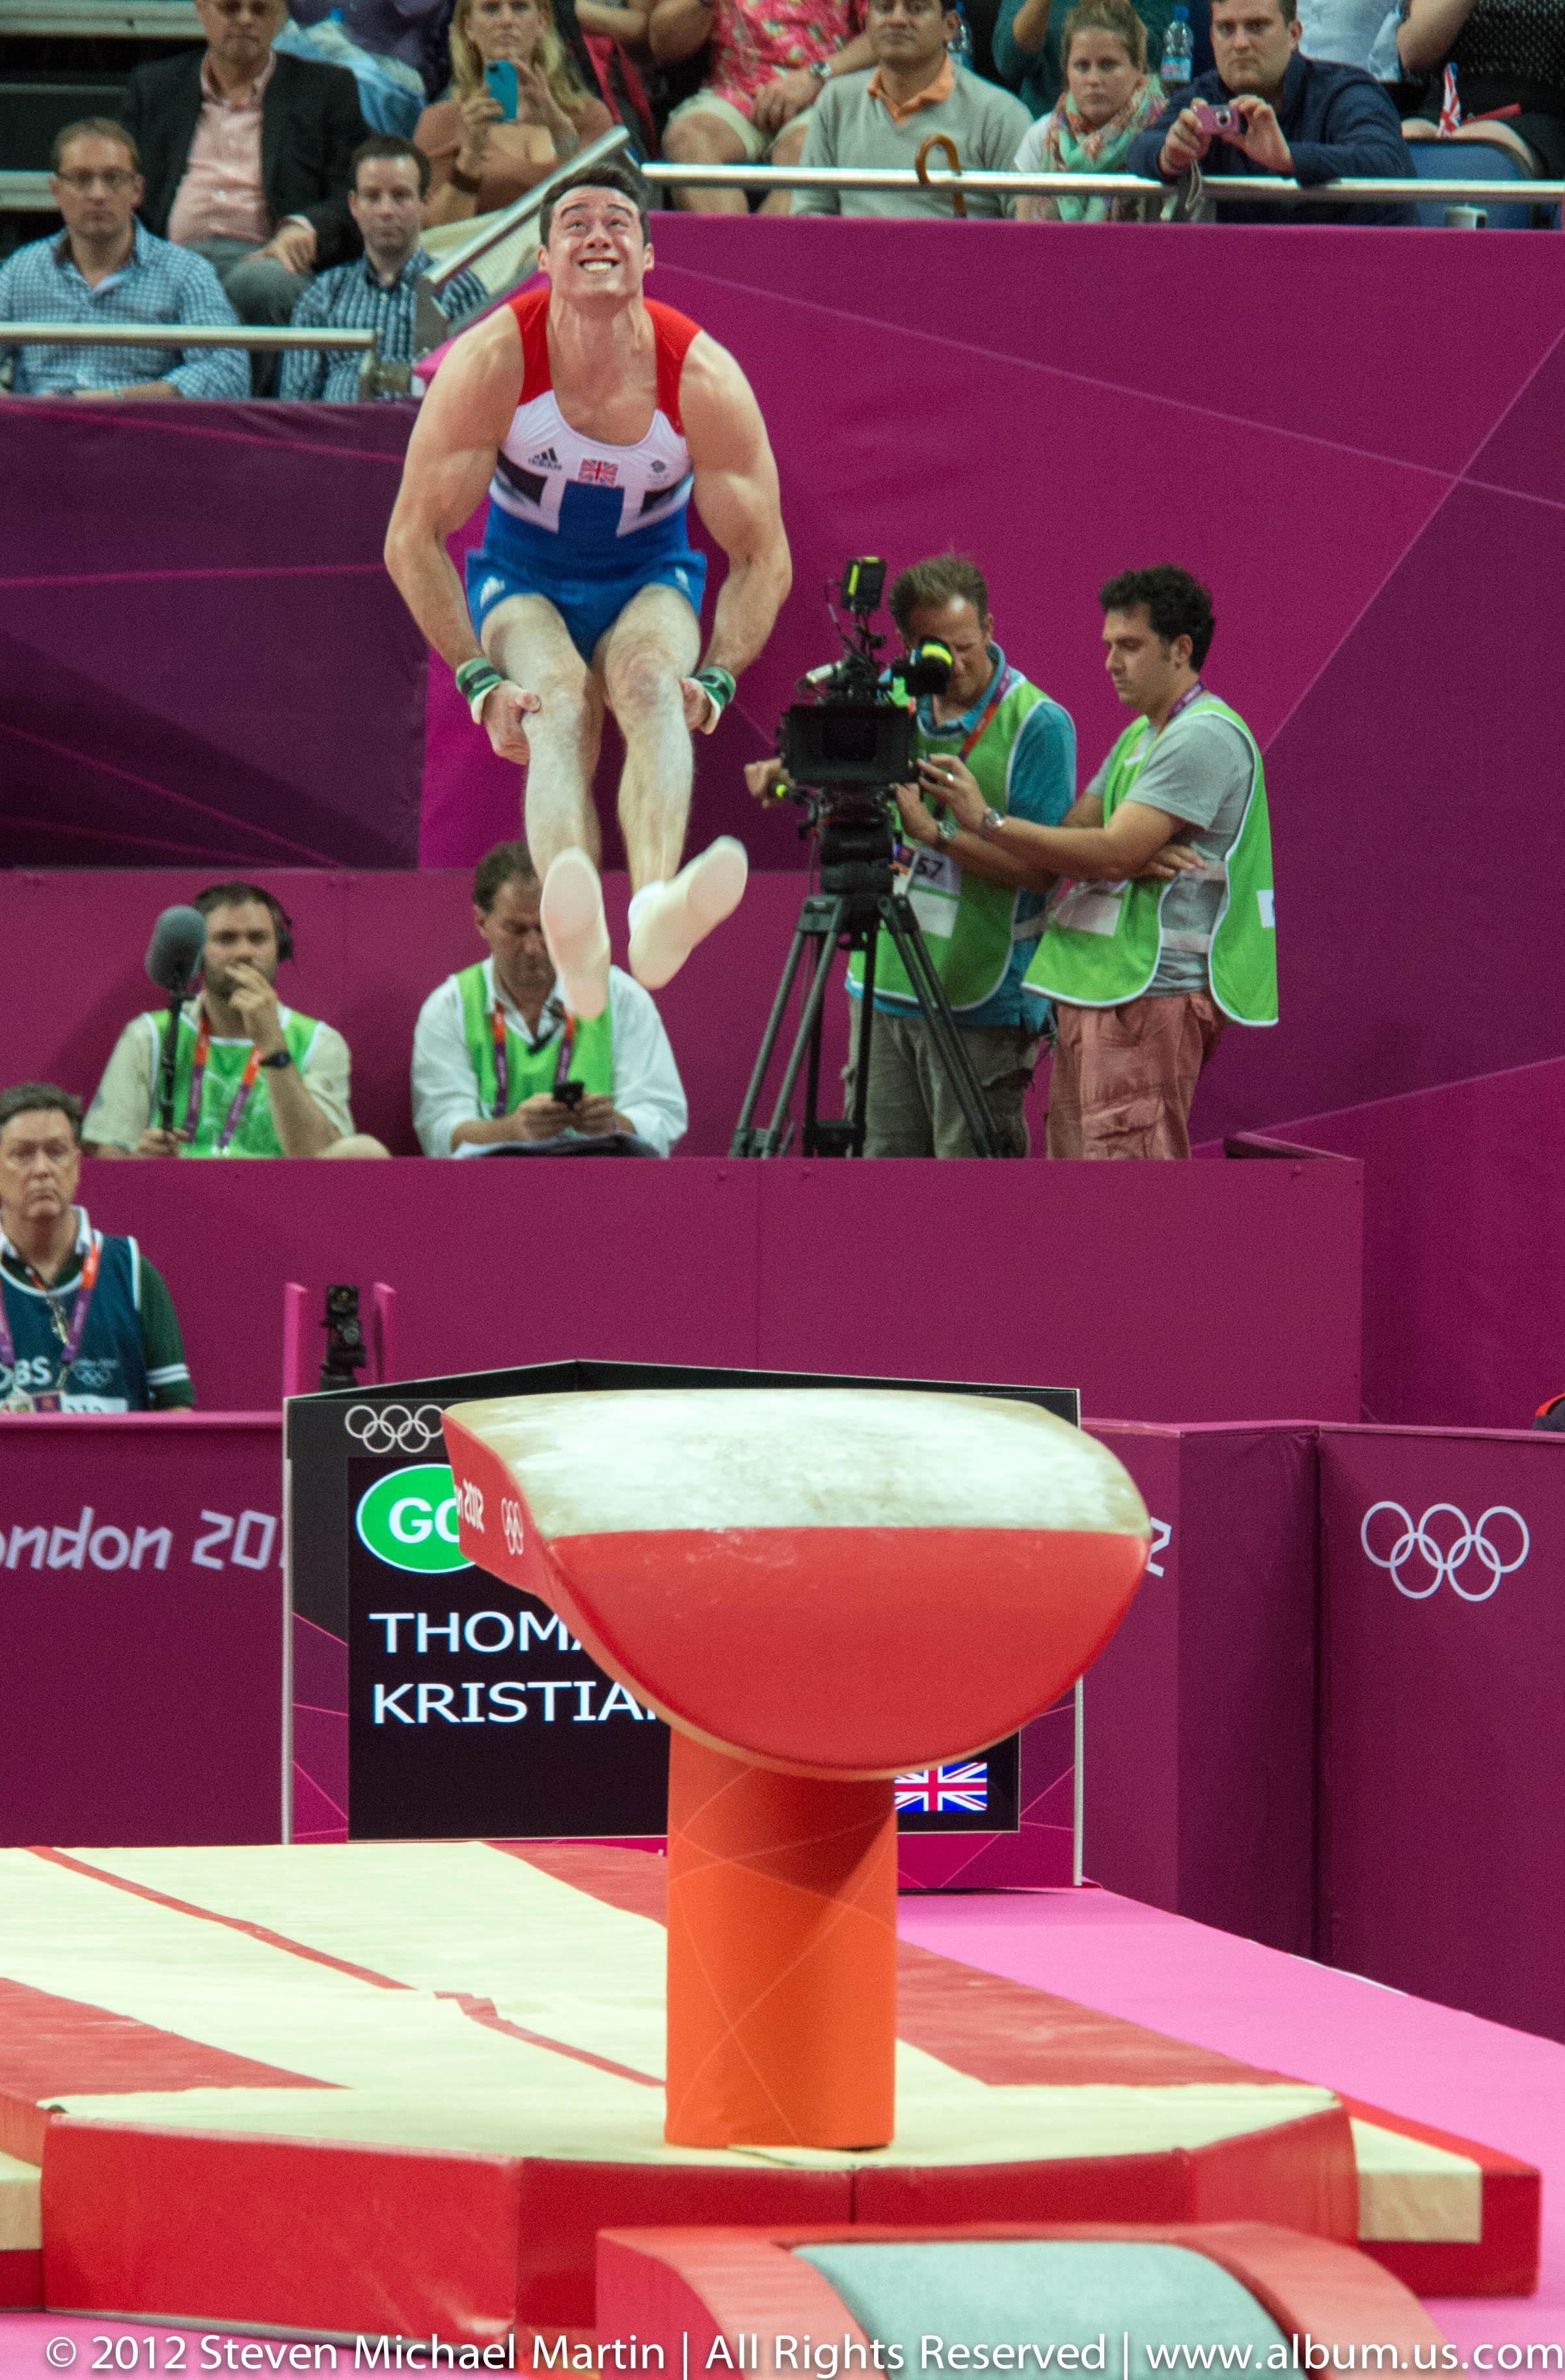 SMartin_2012 Olympics Gymastics_5954039